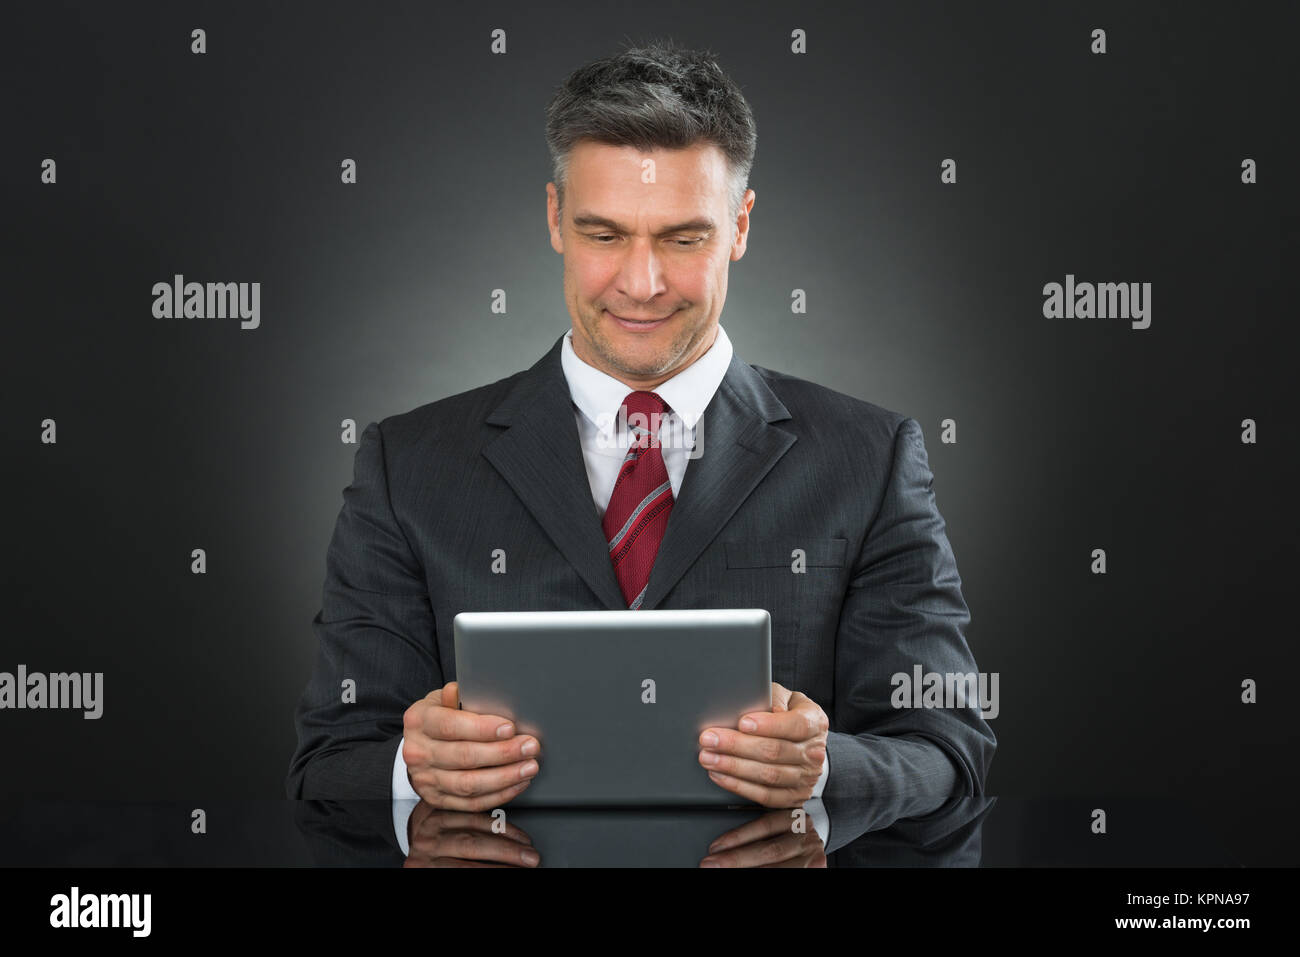 Businessman Using Digital Tablet - Stock Image